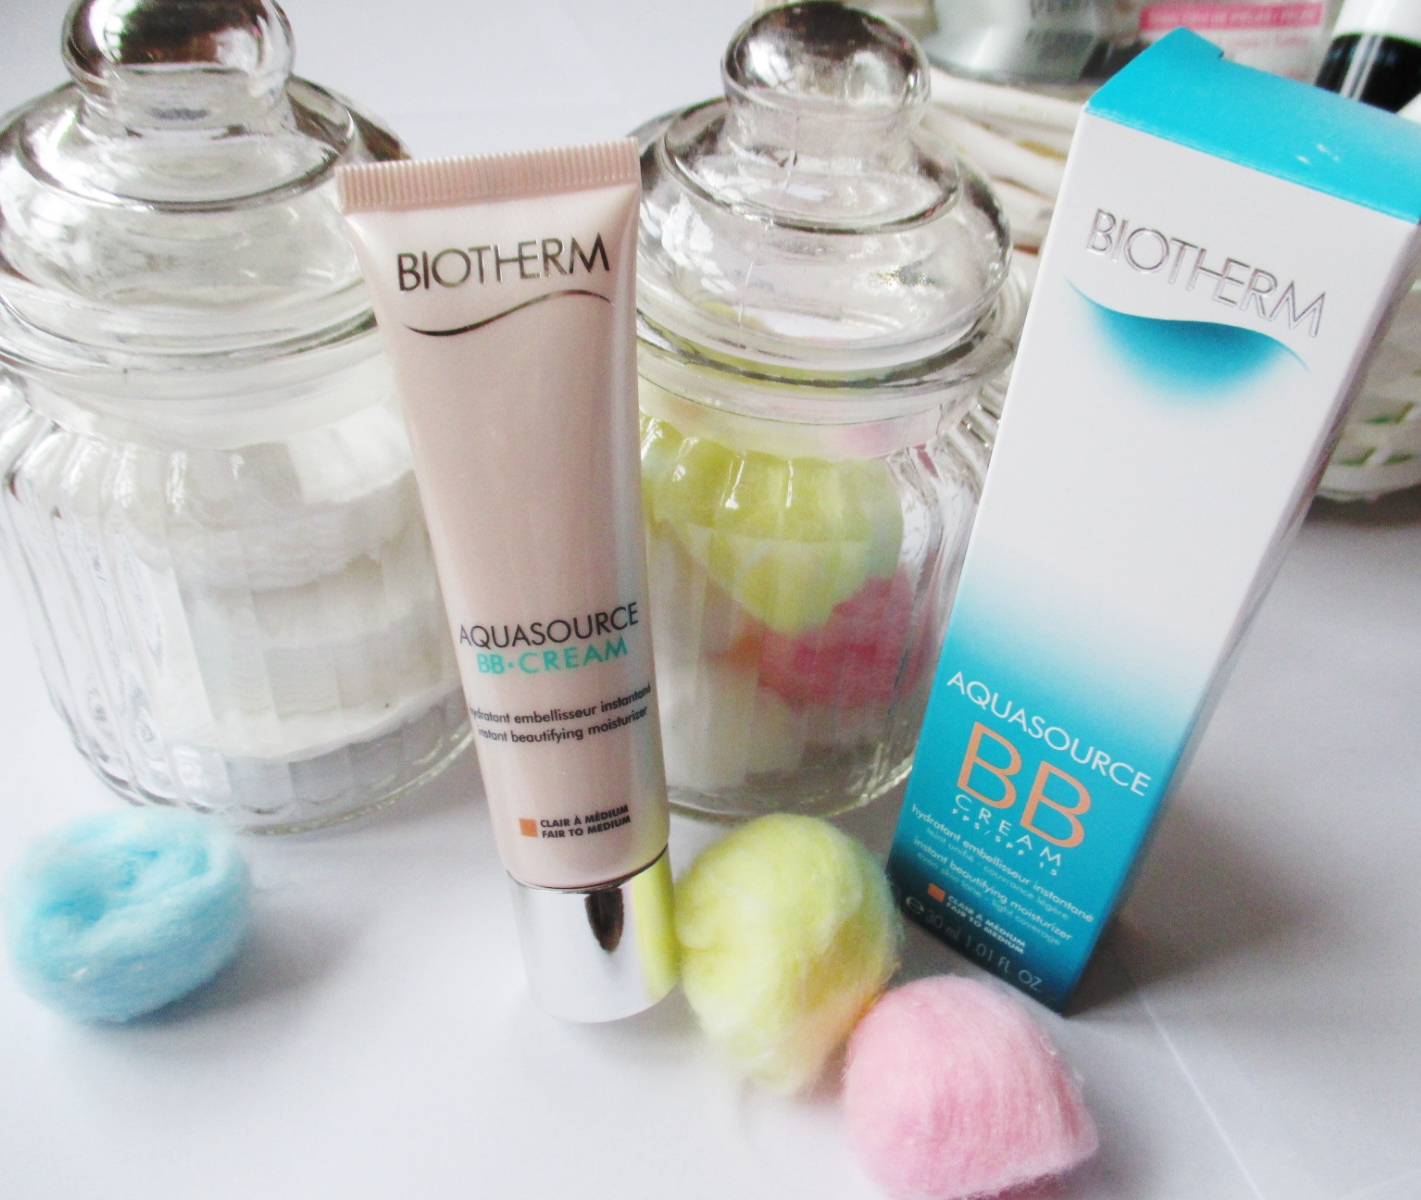 Biotherm BB Cream Aquasource